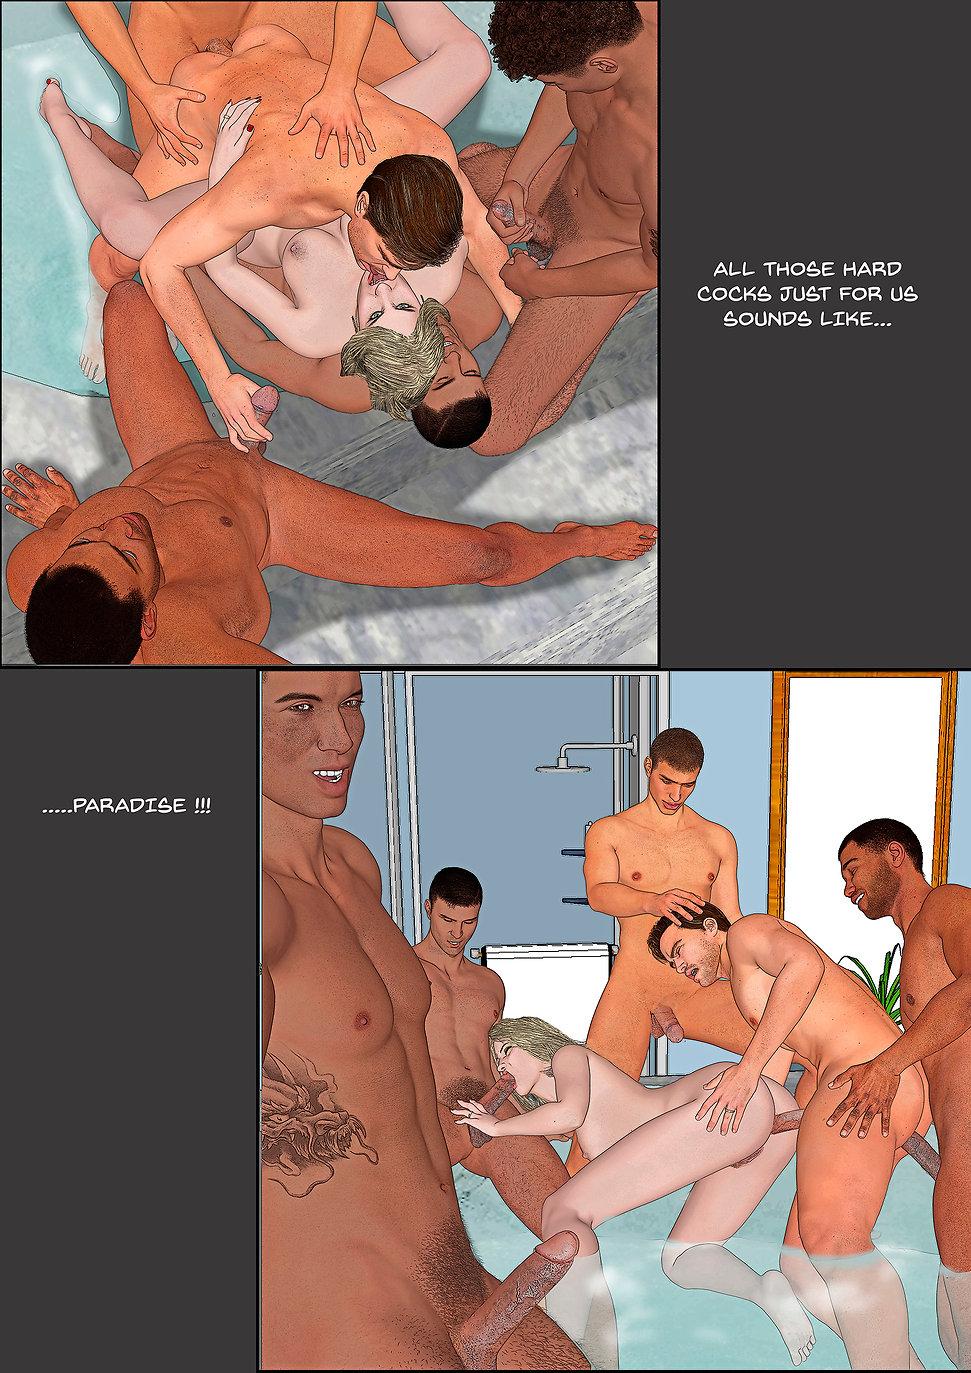 bisex couple gangbang in bathtub